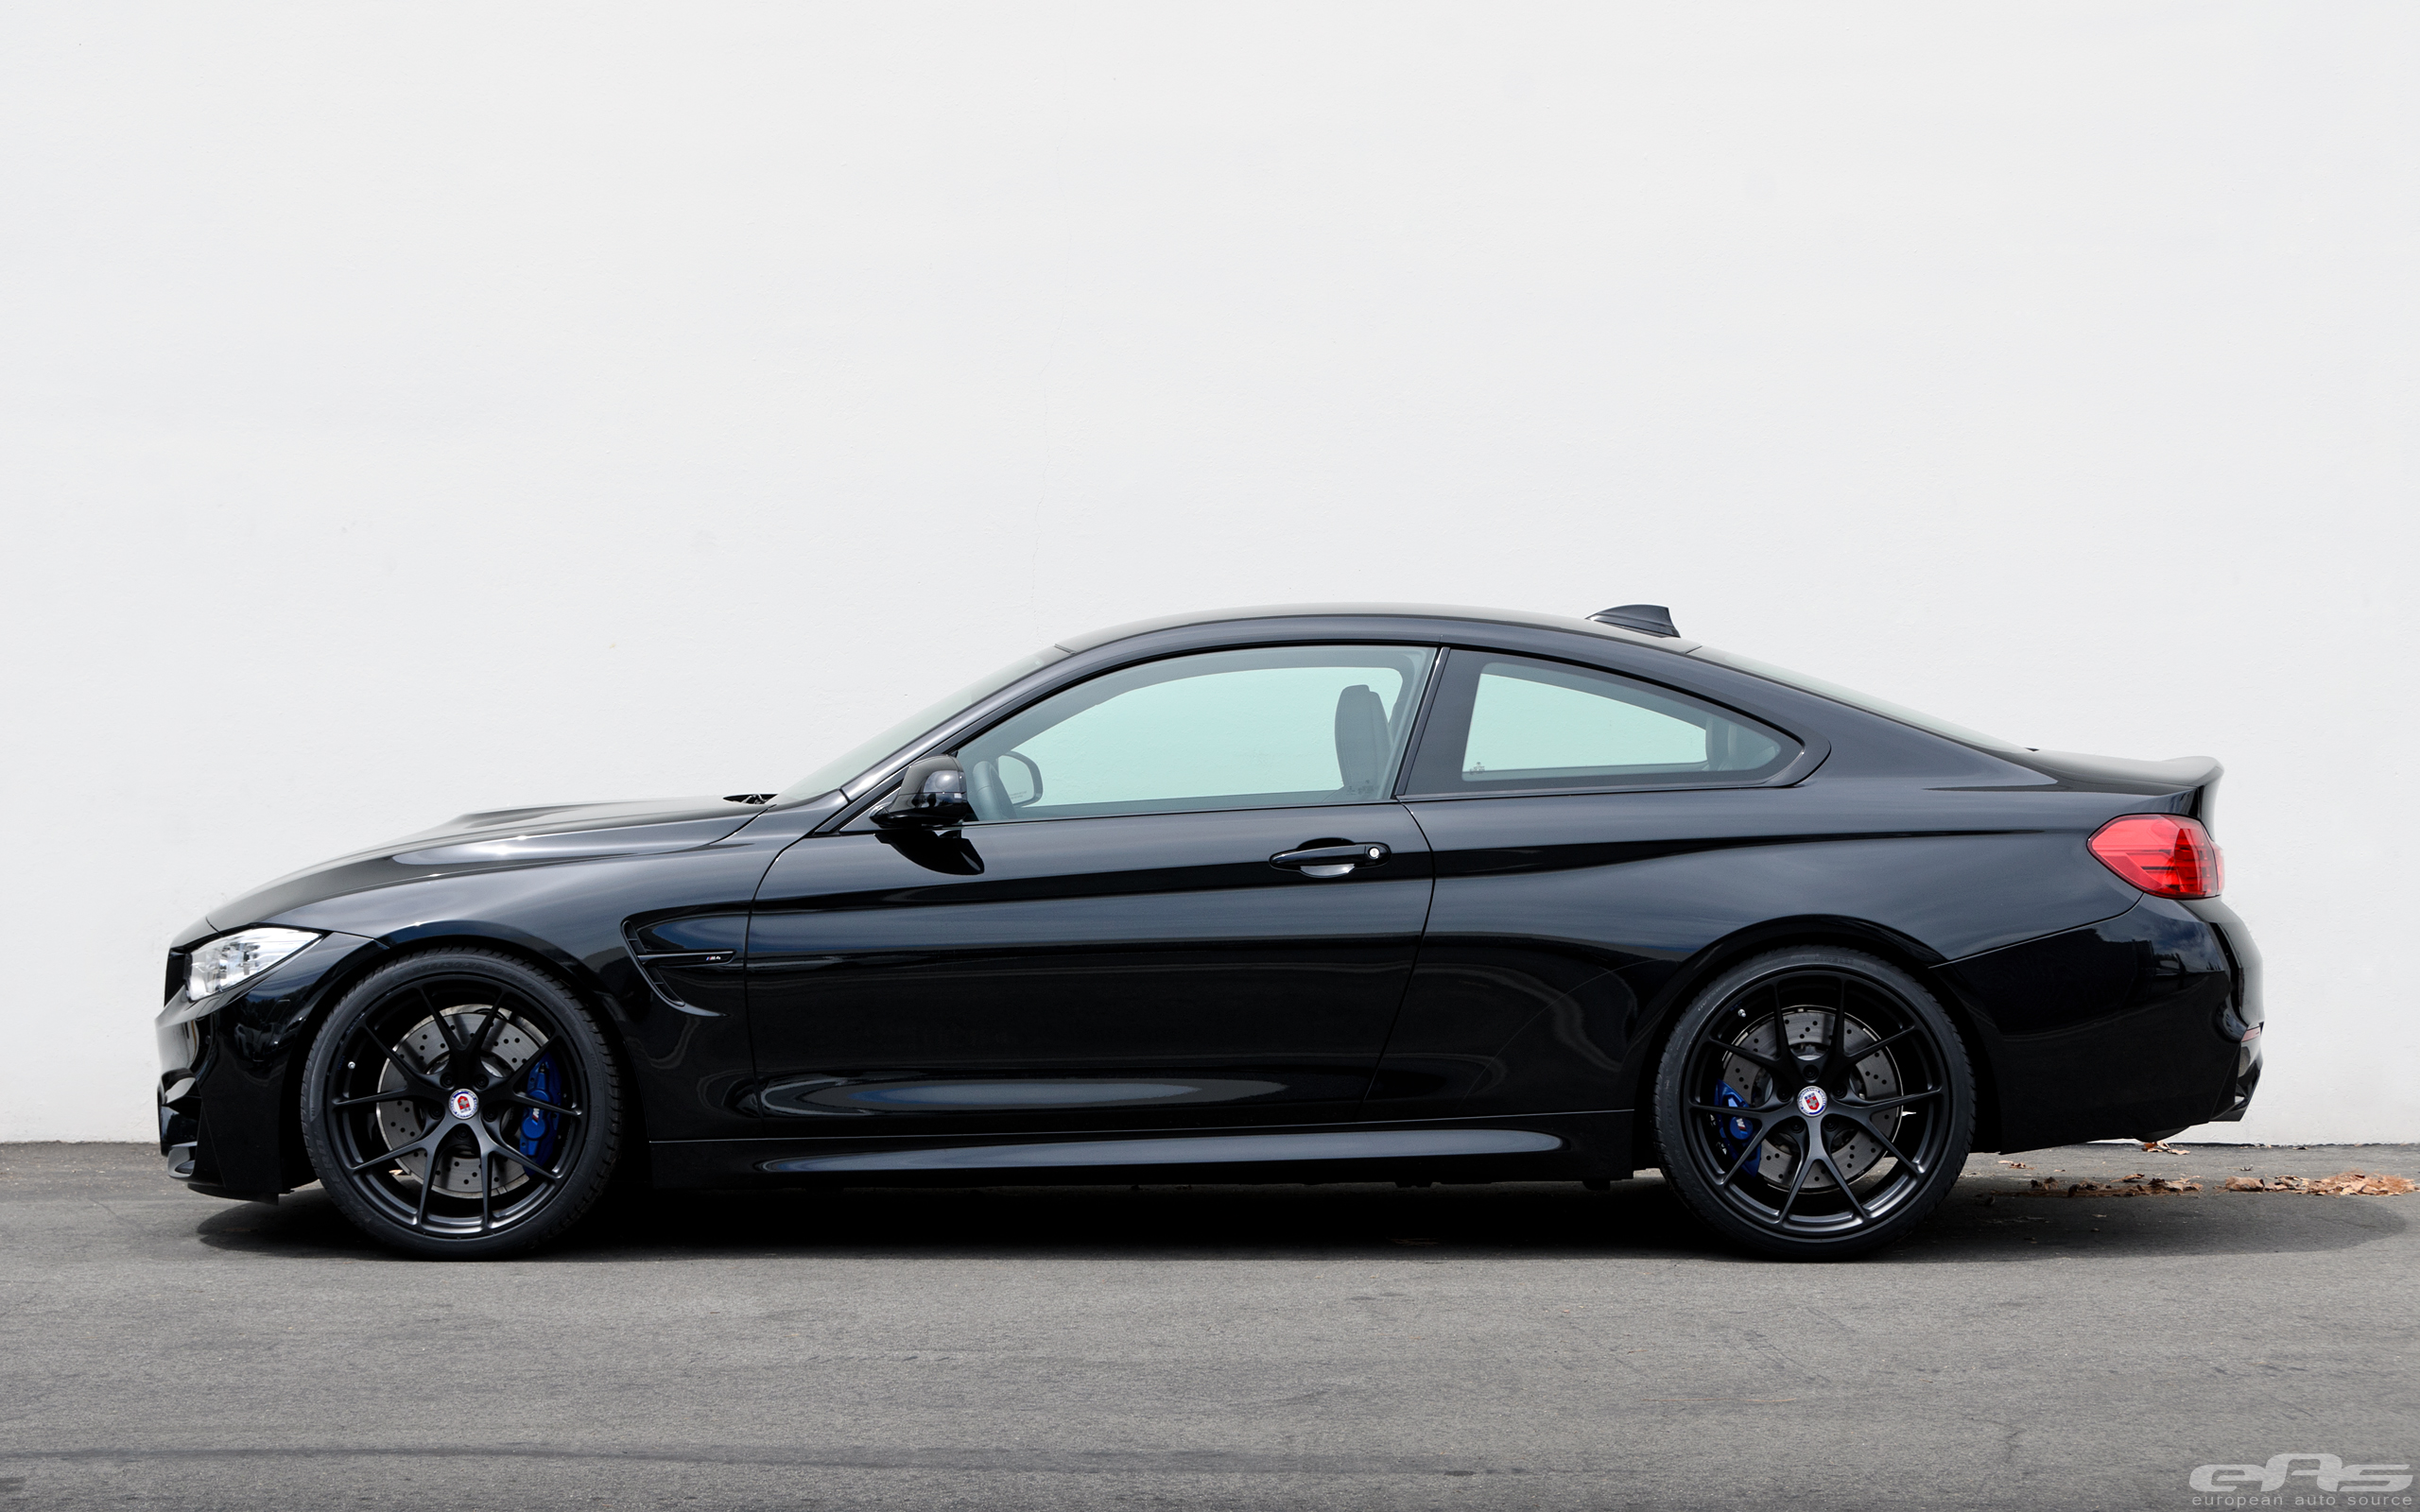 Matte Black Hre Wheels For A Black Sapphire M4 Bmw Performance